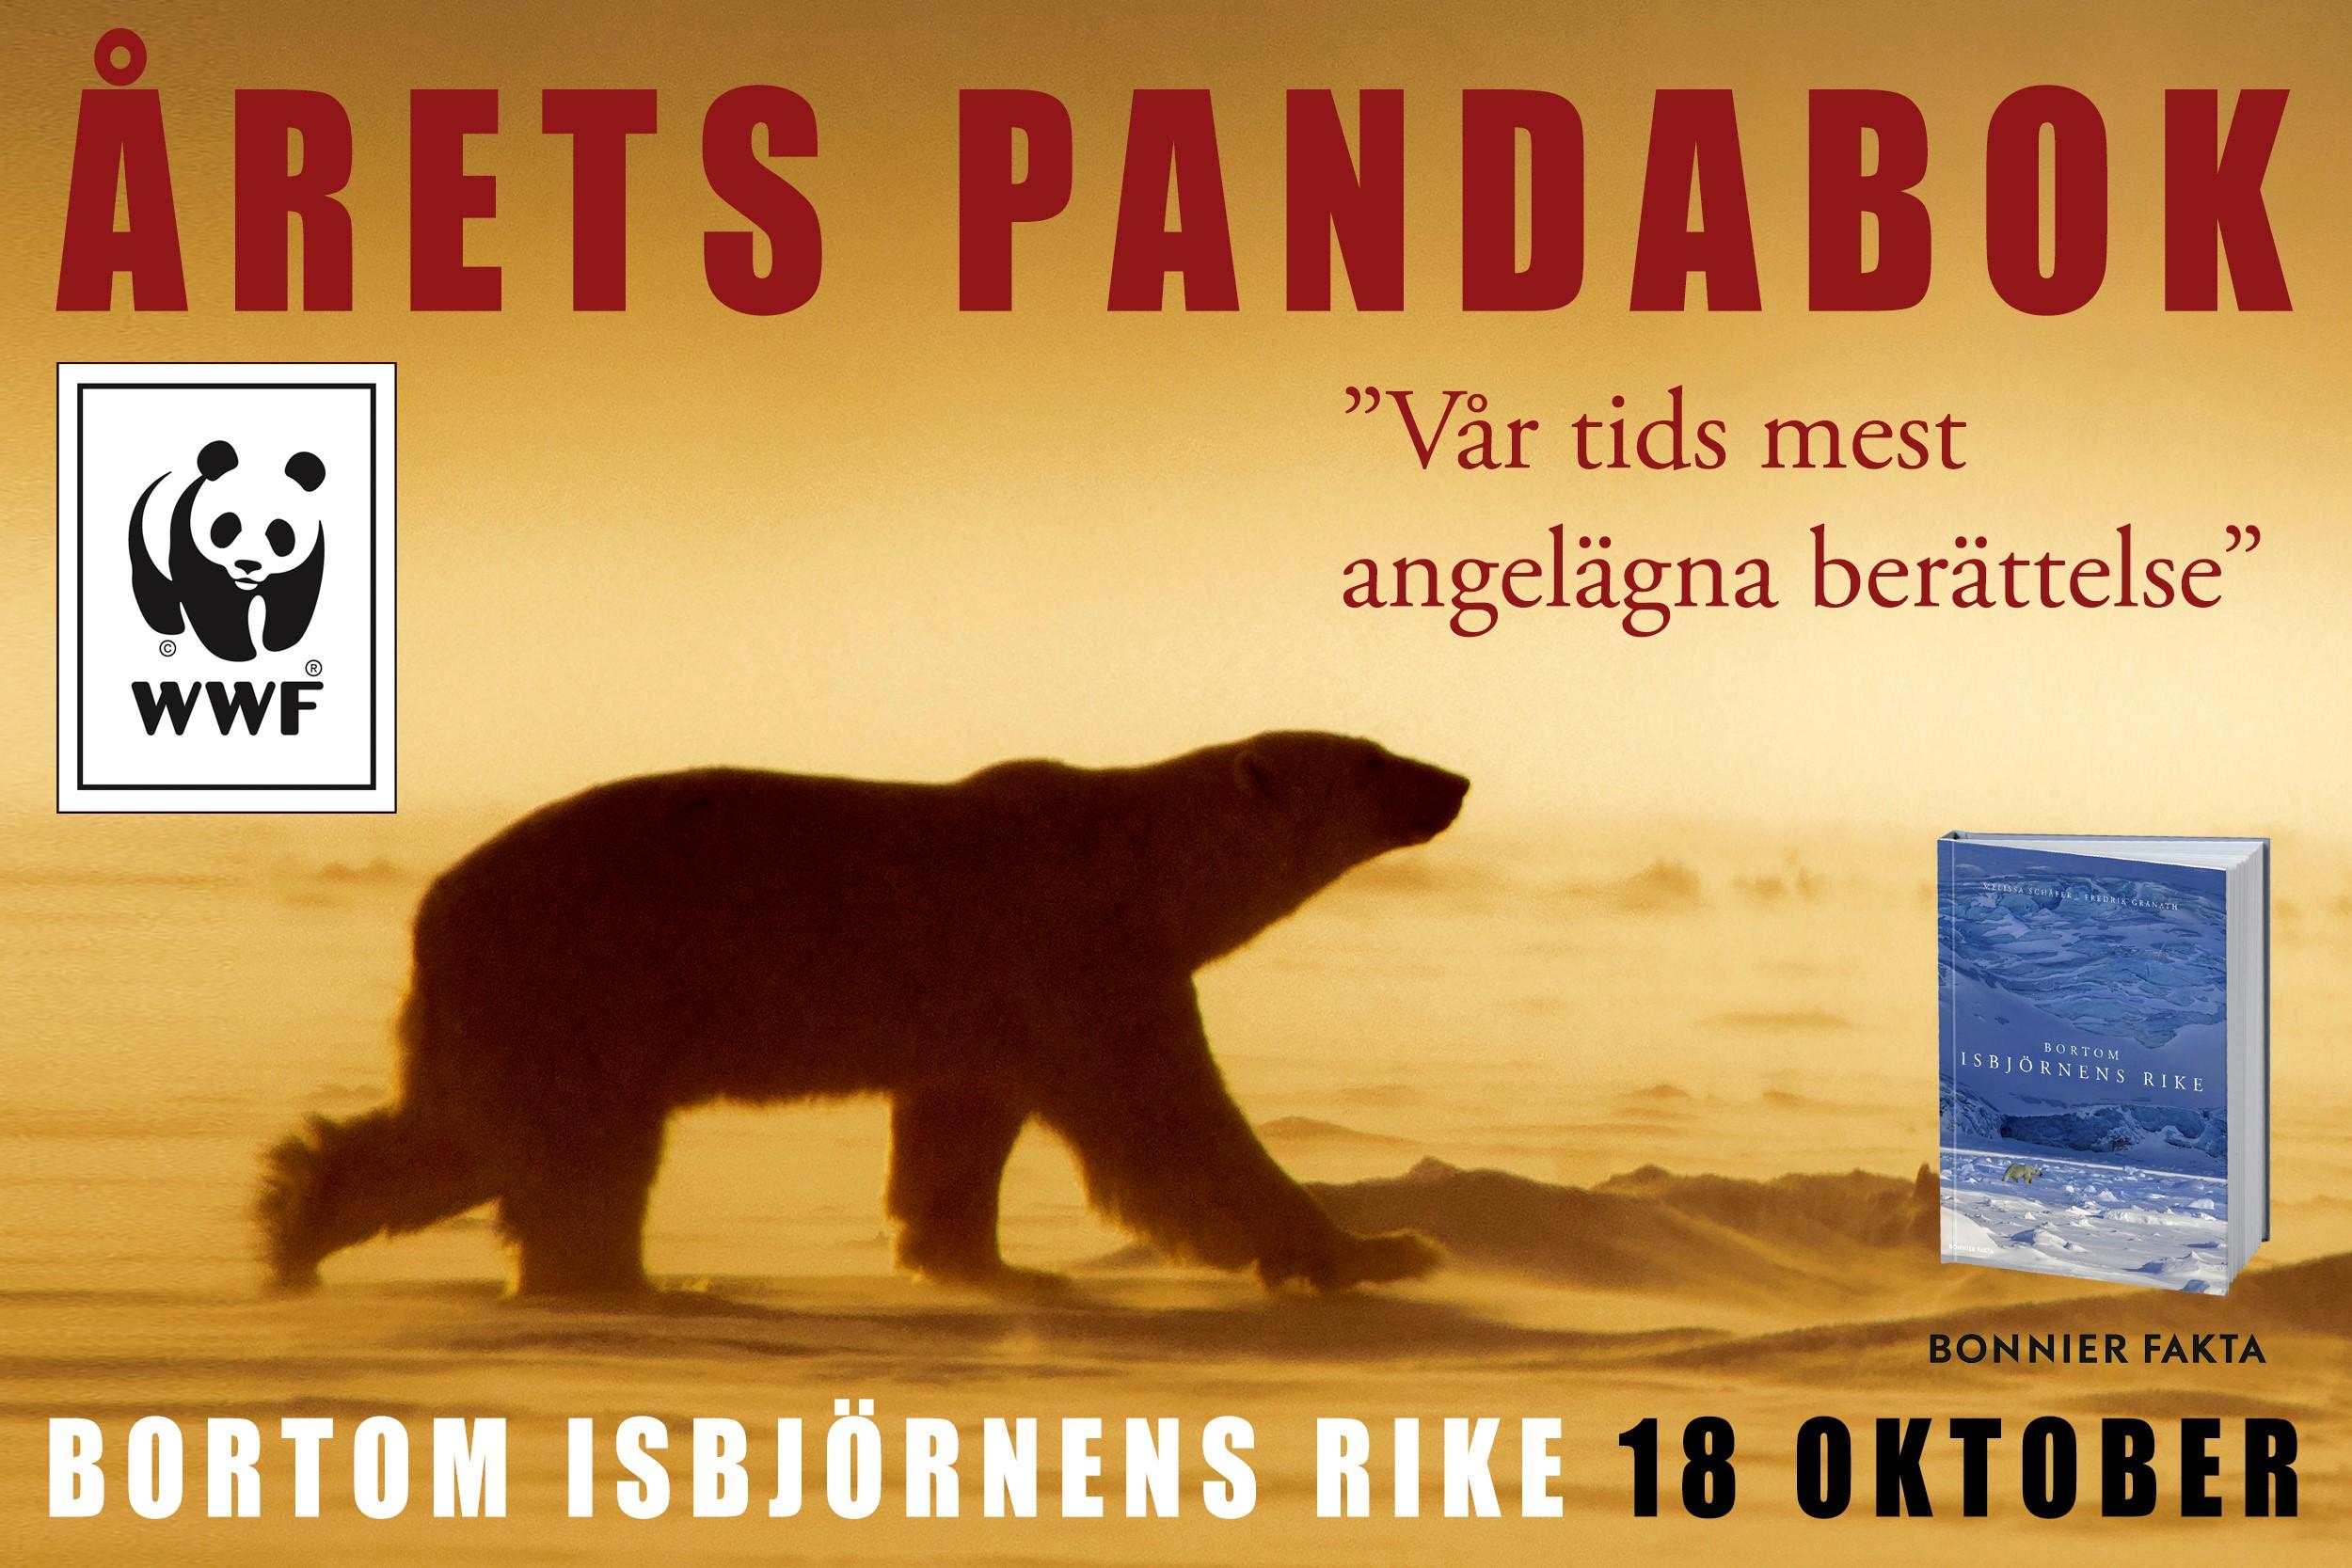 Årets Pandabok 2019